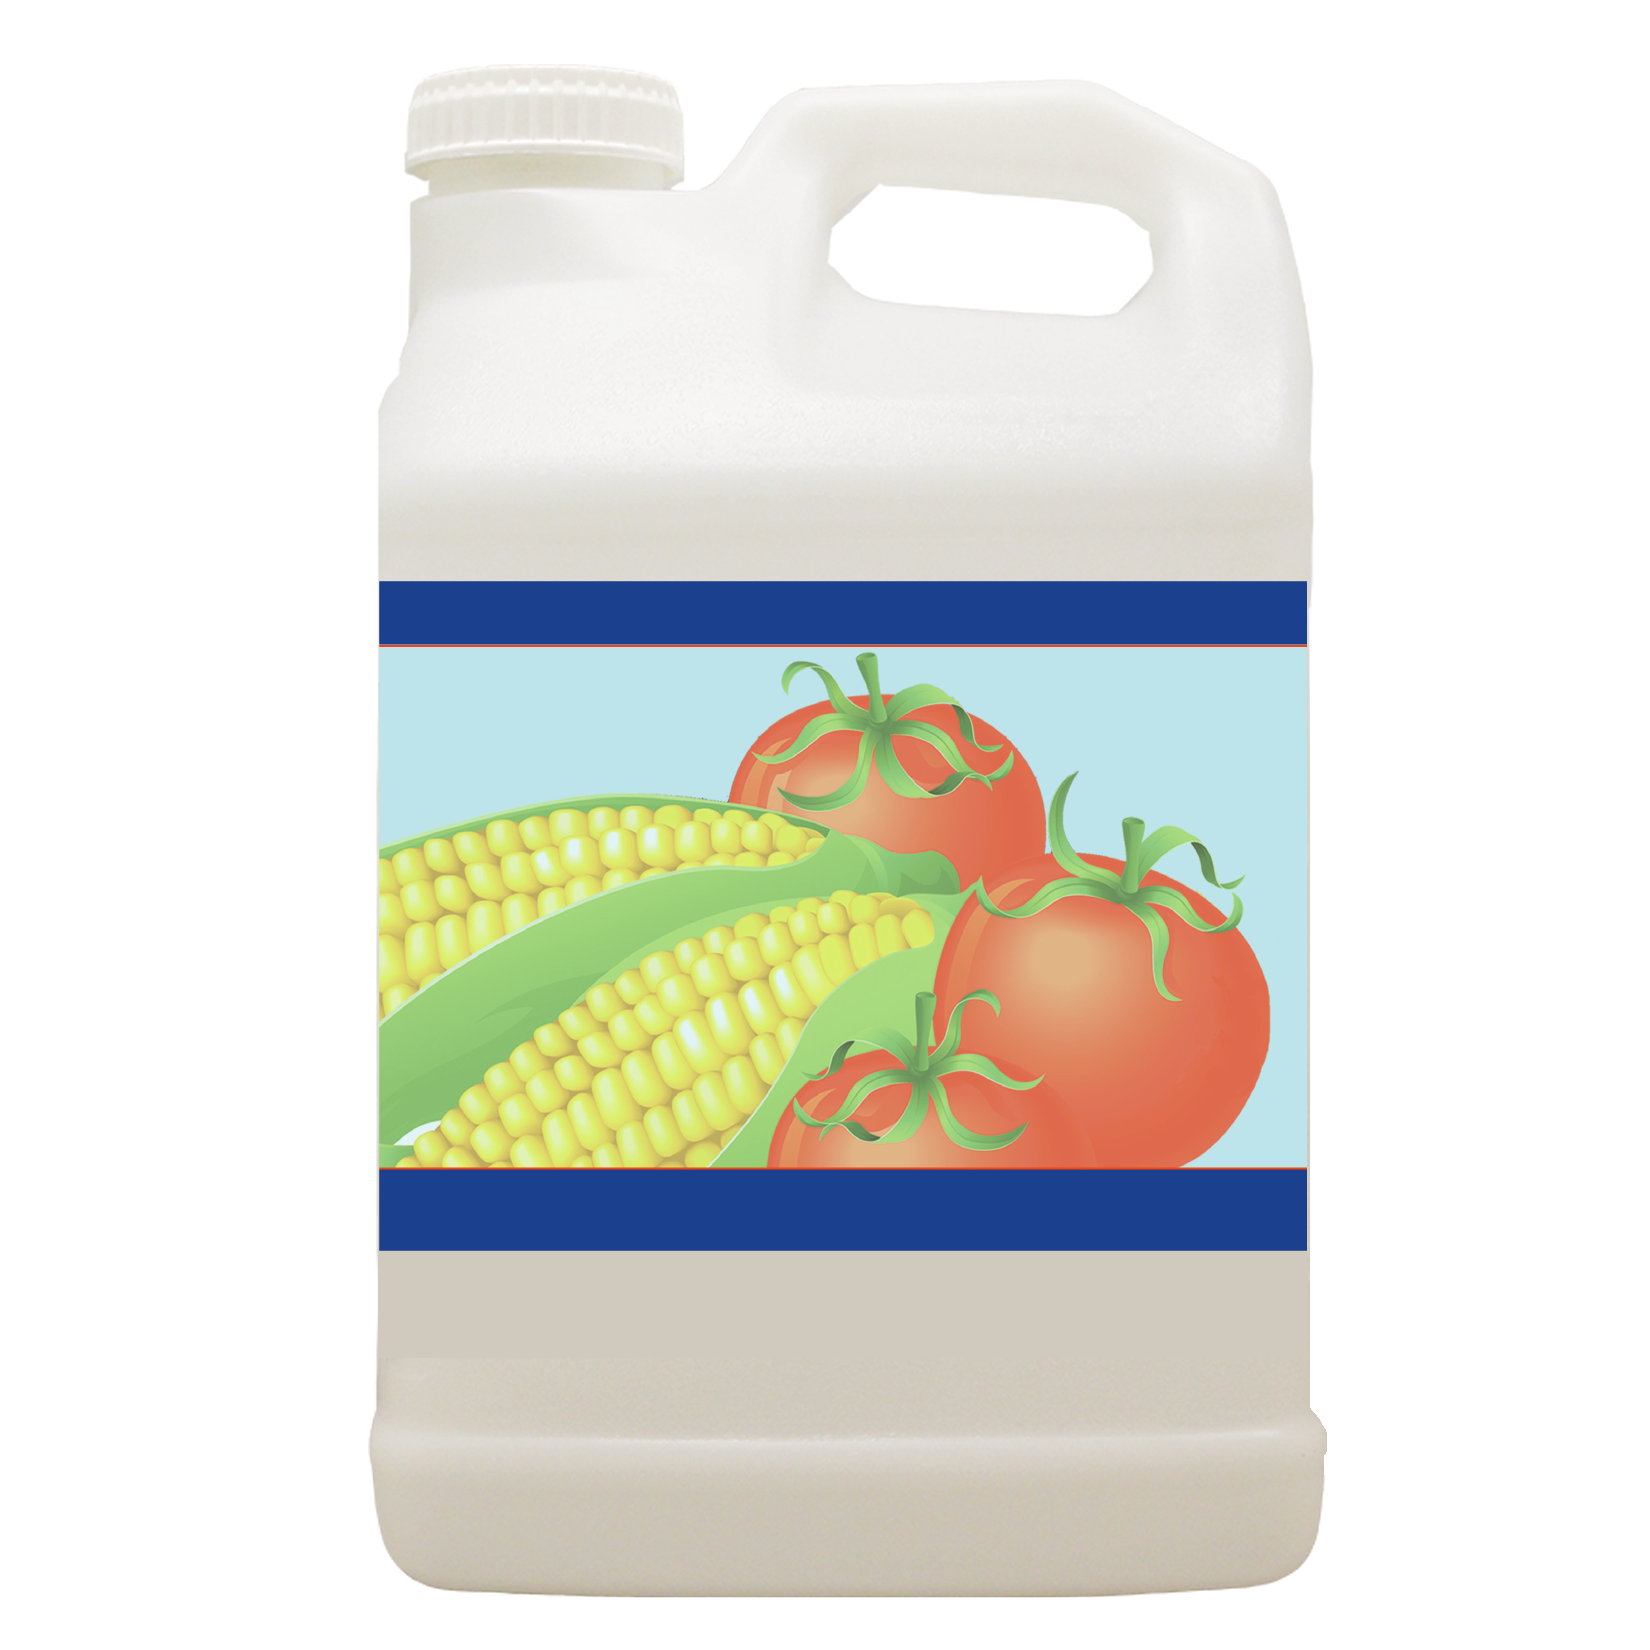 holganix agriculture jug